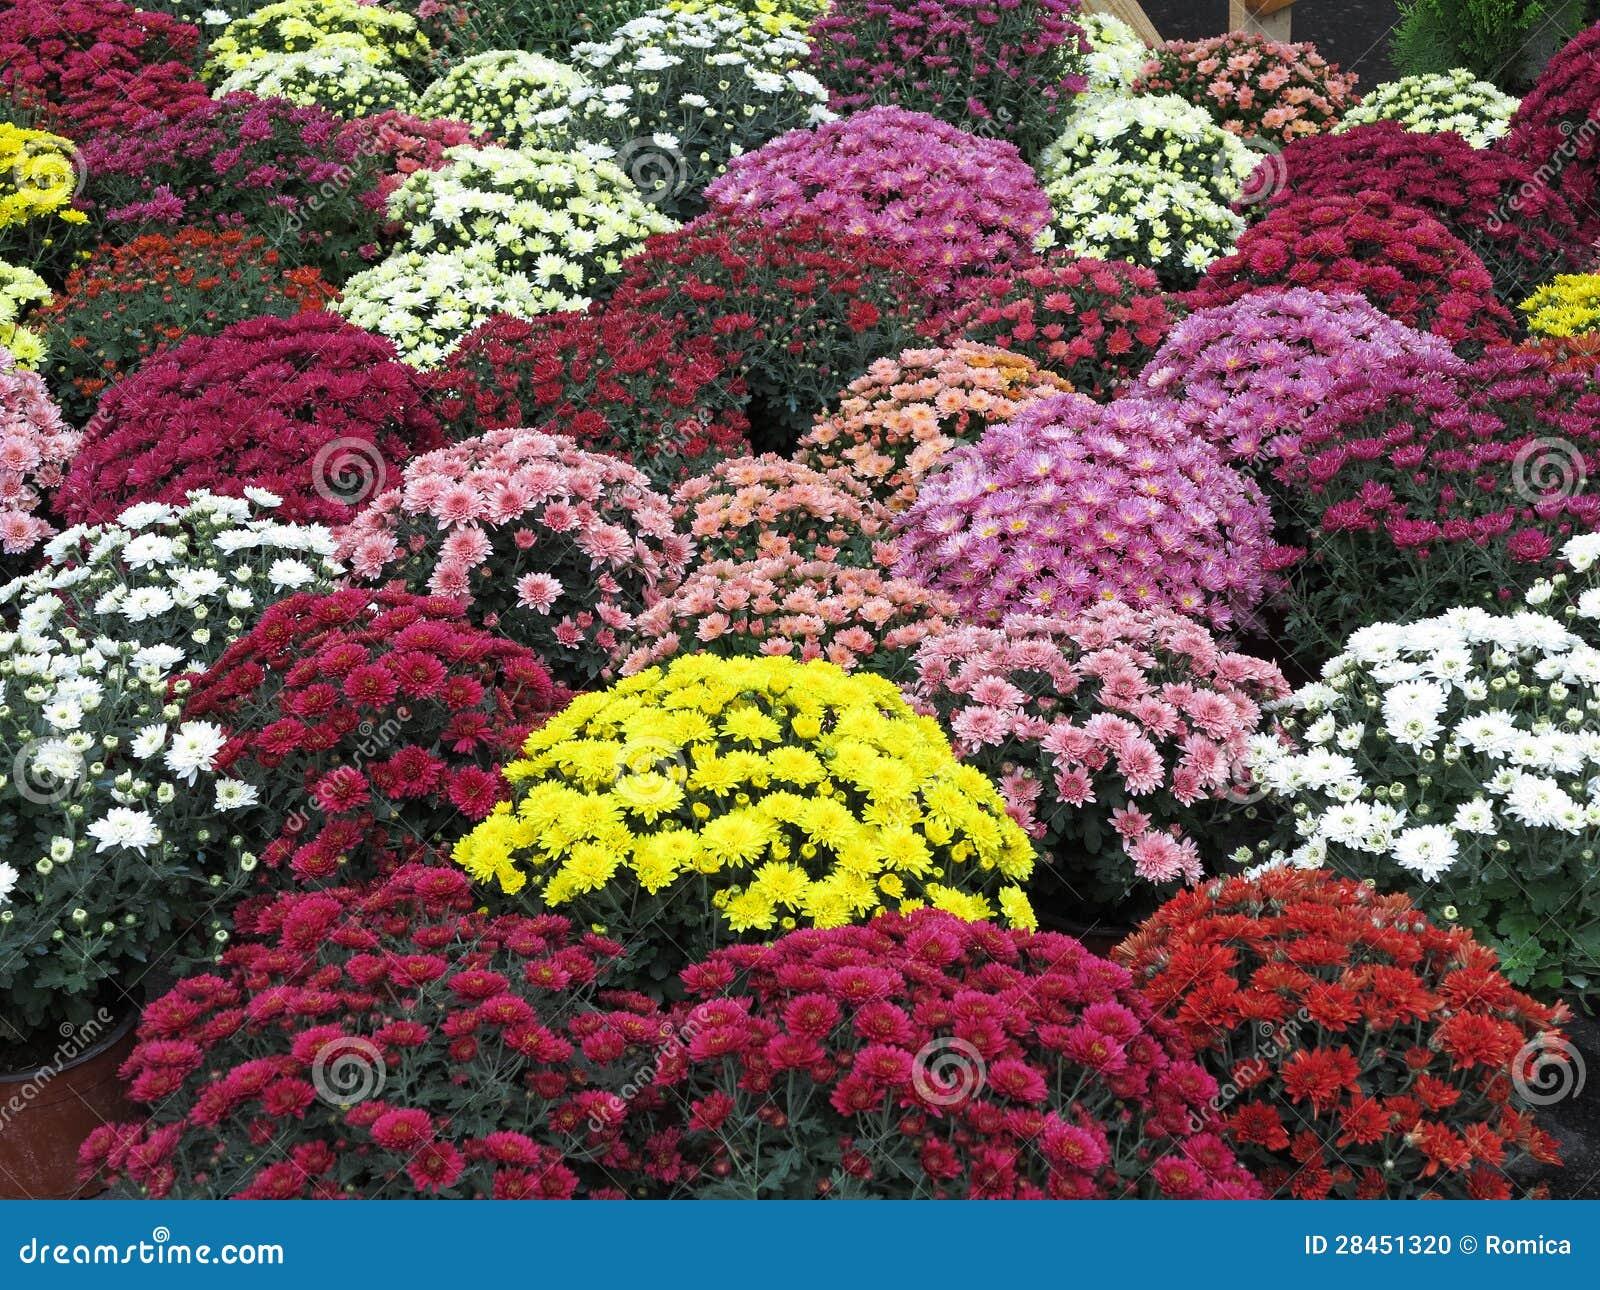 flores coloridas jardim:Colorful Flower Garden